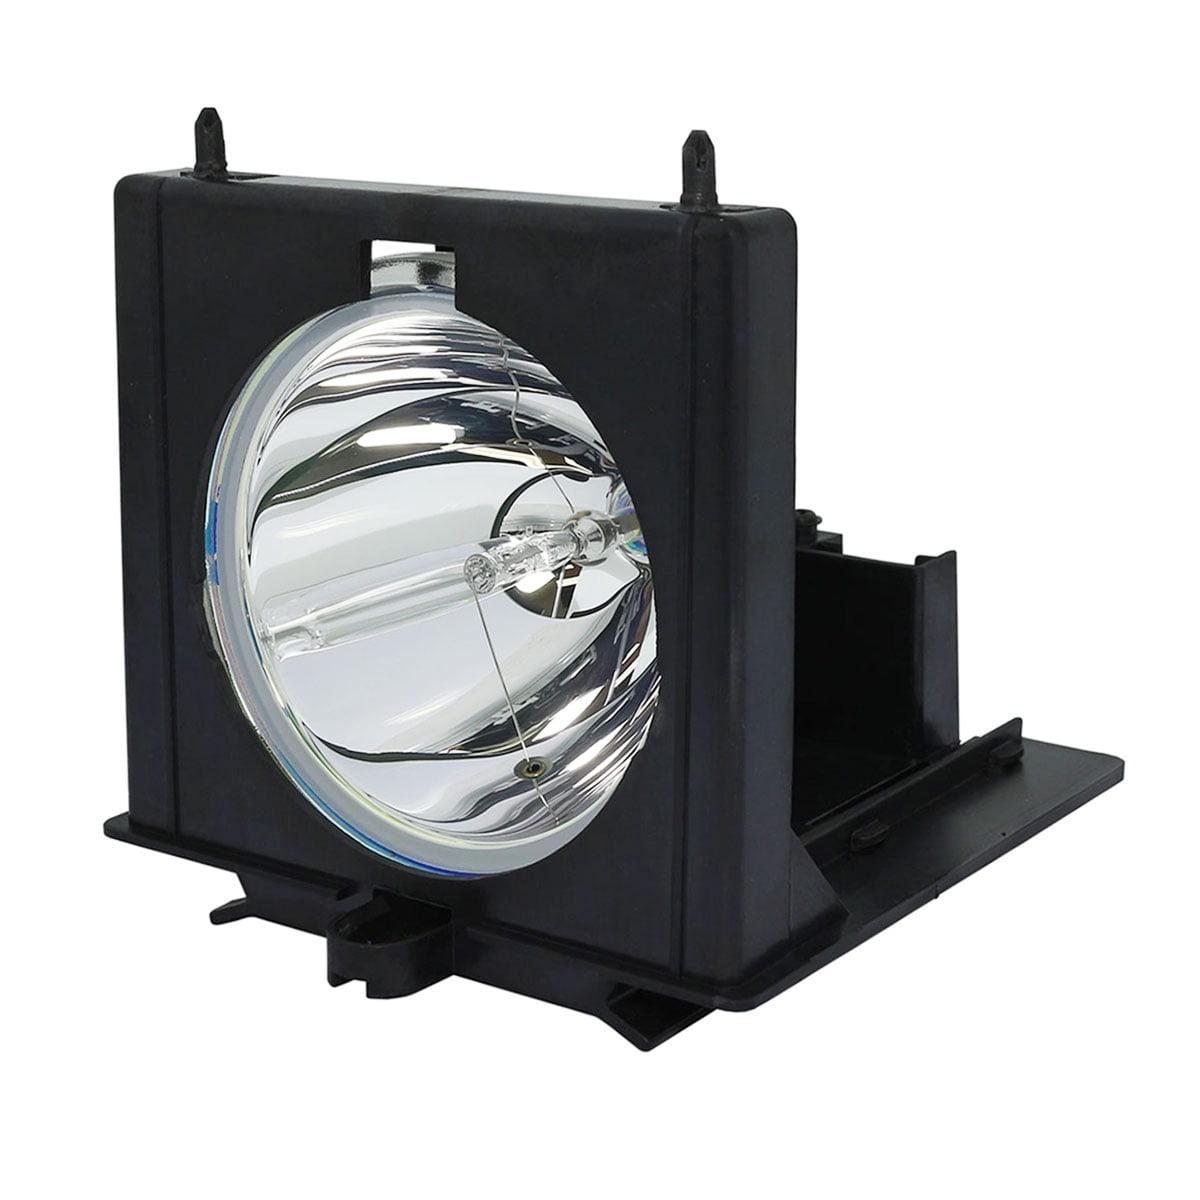 Lutema Platinum for RCA HD61LPW42YX6 TV Lamp with Housing (Original Philips Bulb Inside) - image 5 of 5